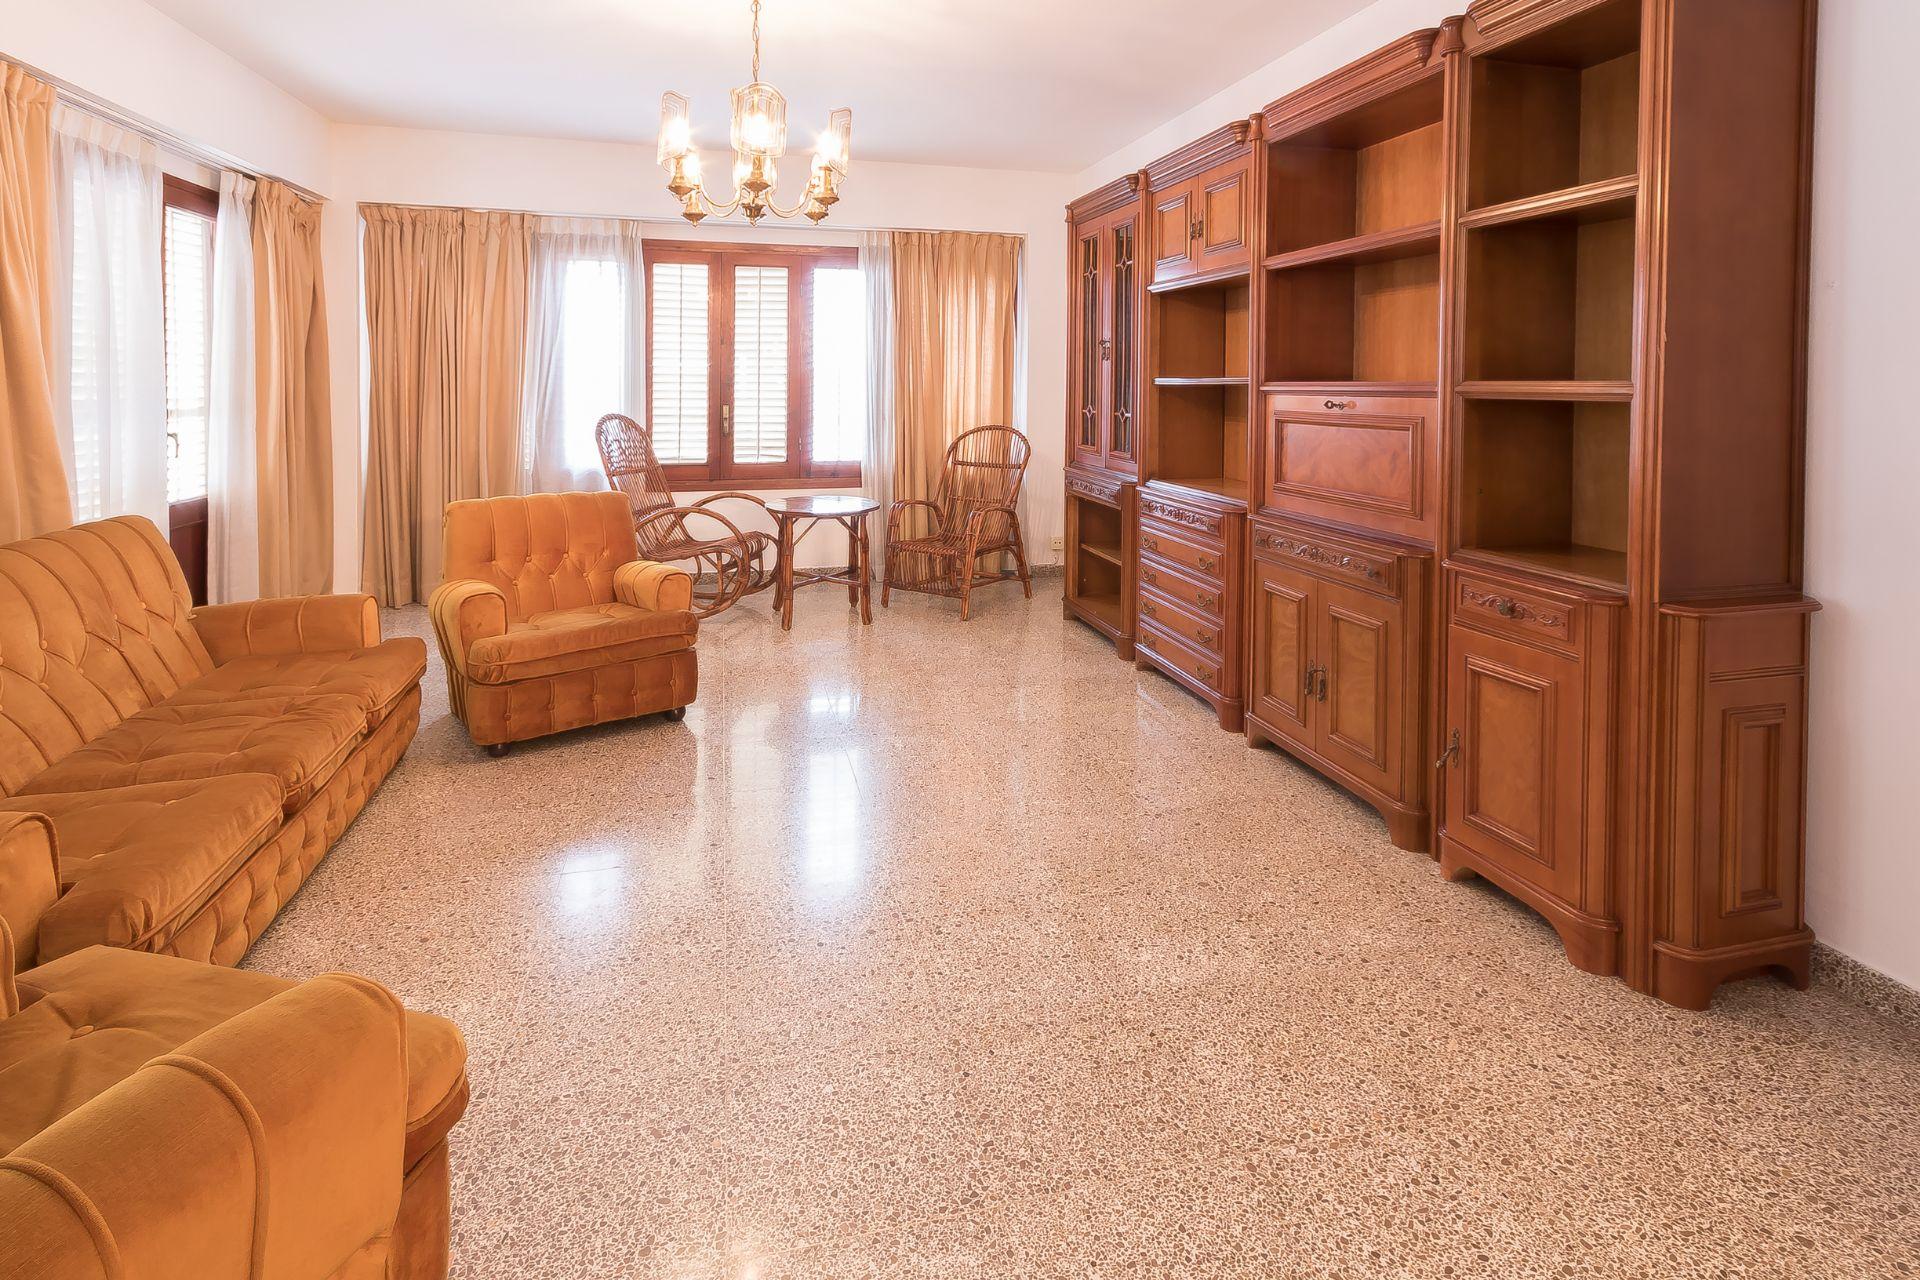 For Rent Flat In Sant Antoni De Portmany Centro De San Antonio With Lift